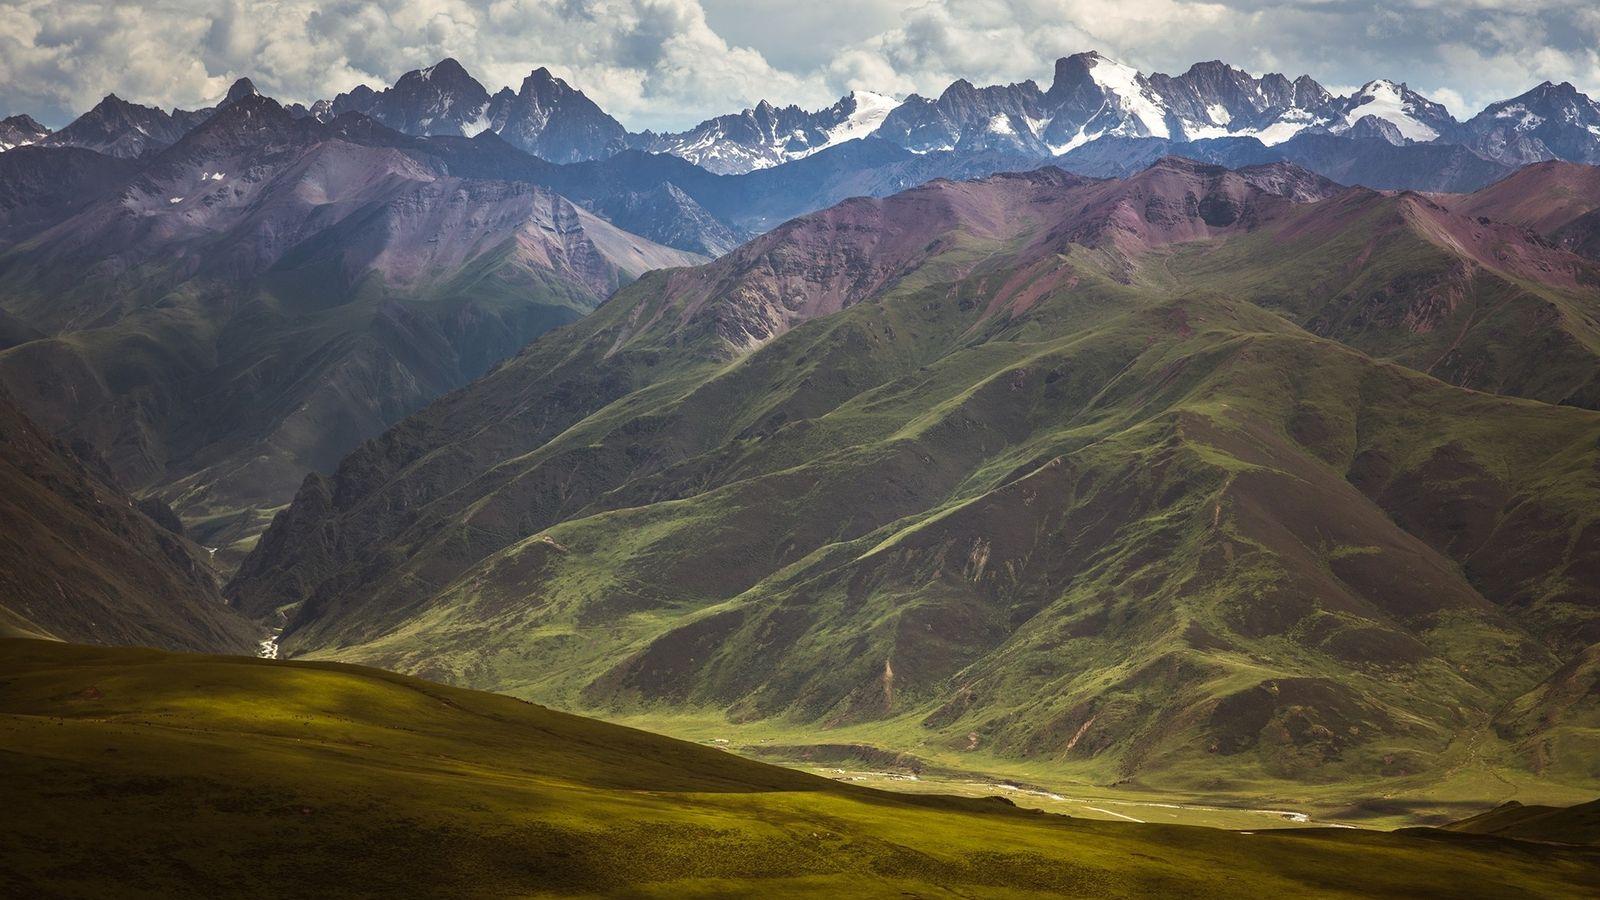 Parque nacional de Sanjiangyuan